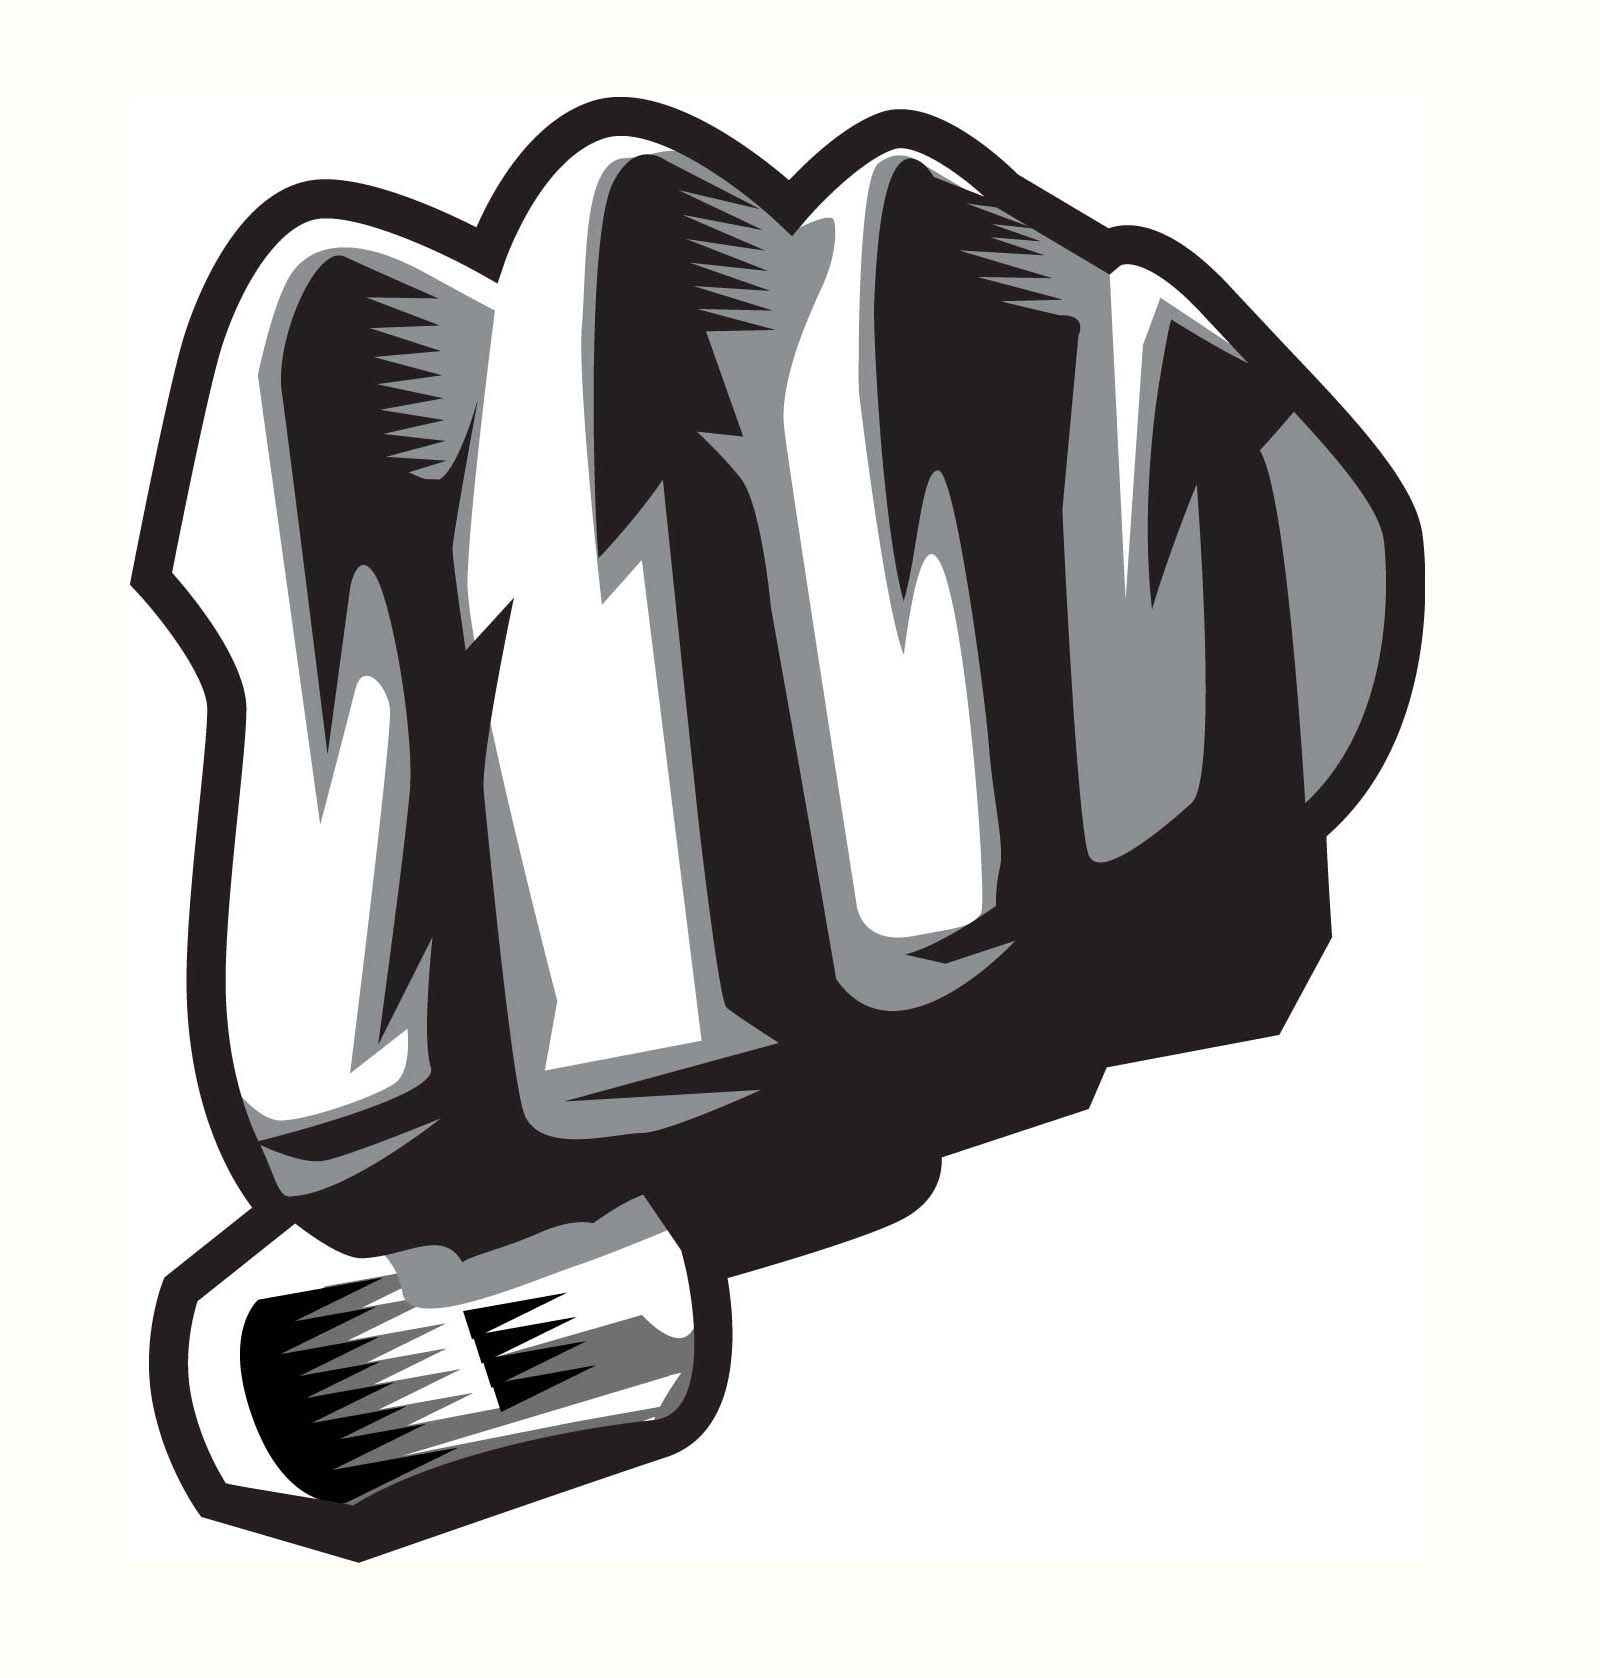 art fist